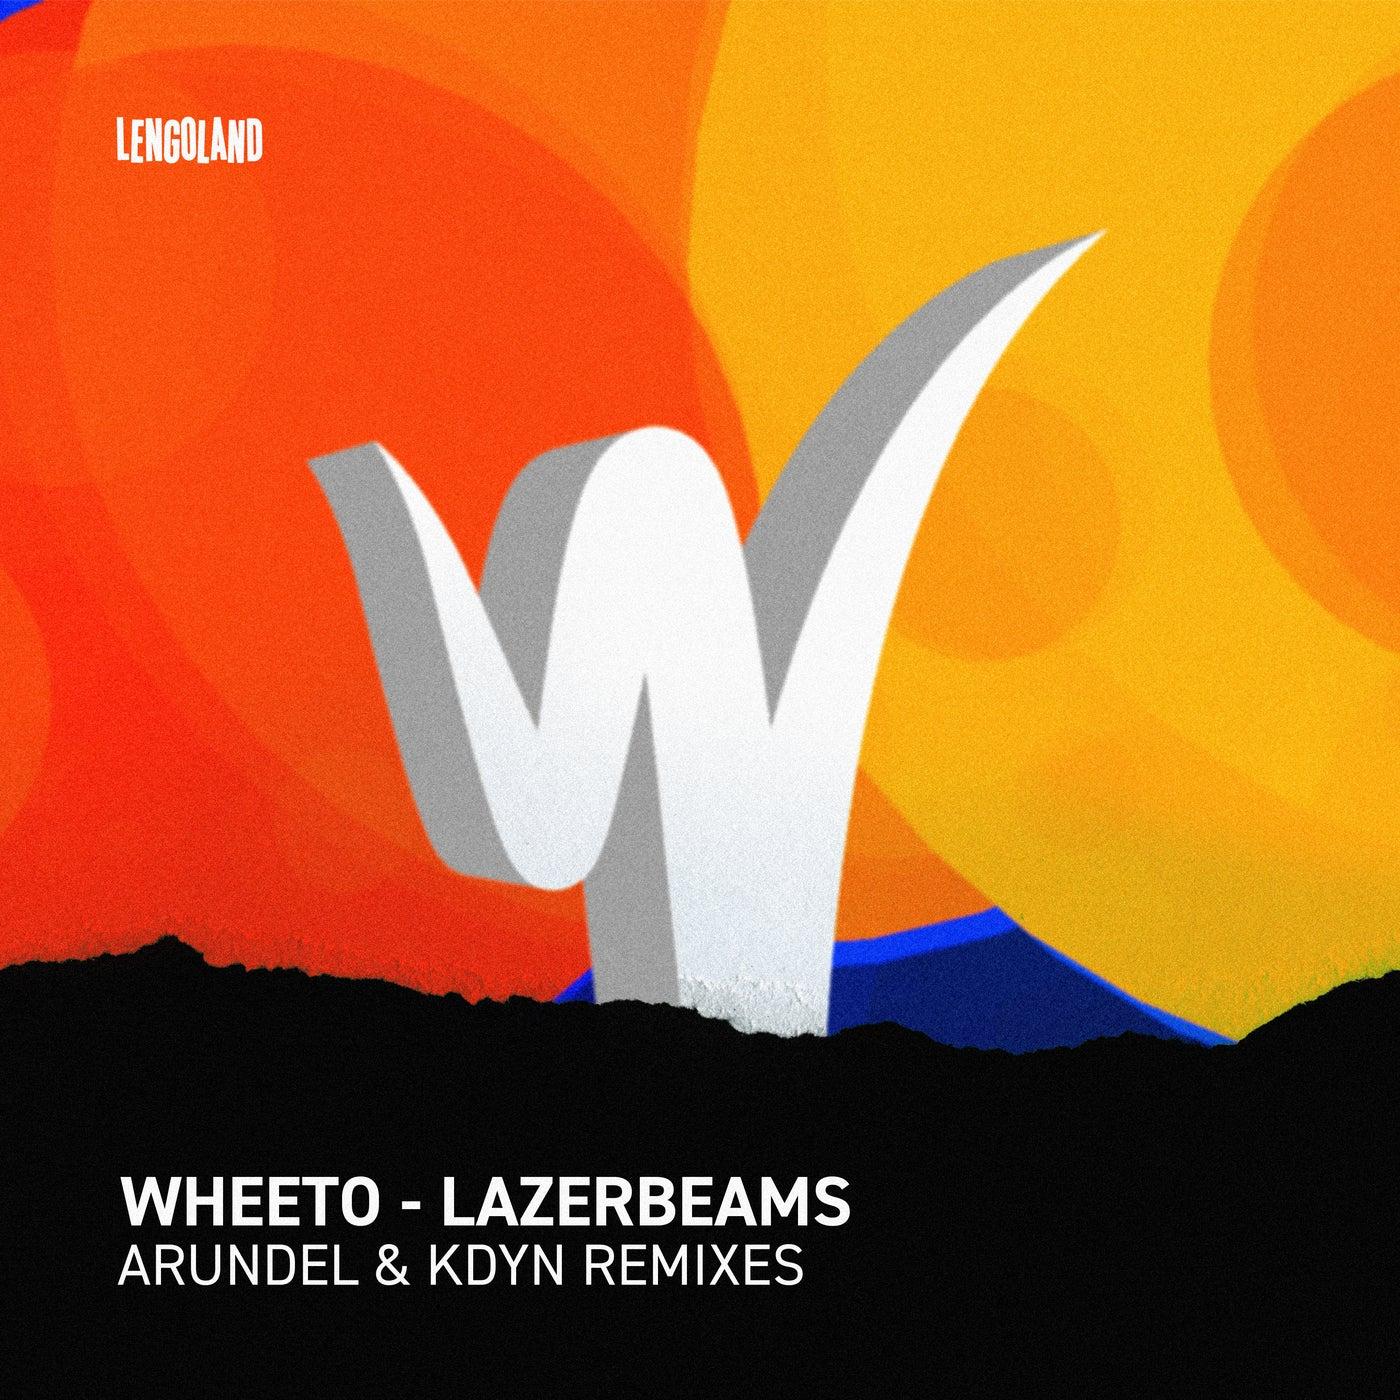 Lazerbeams (Arundel Remix)